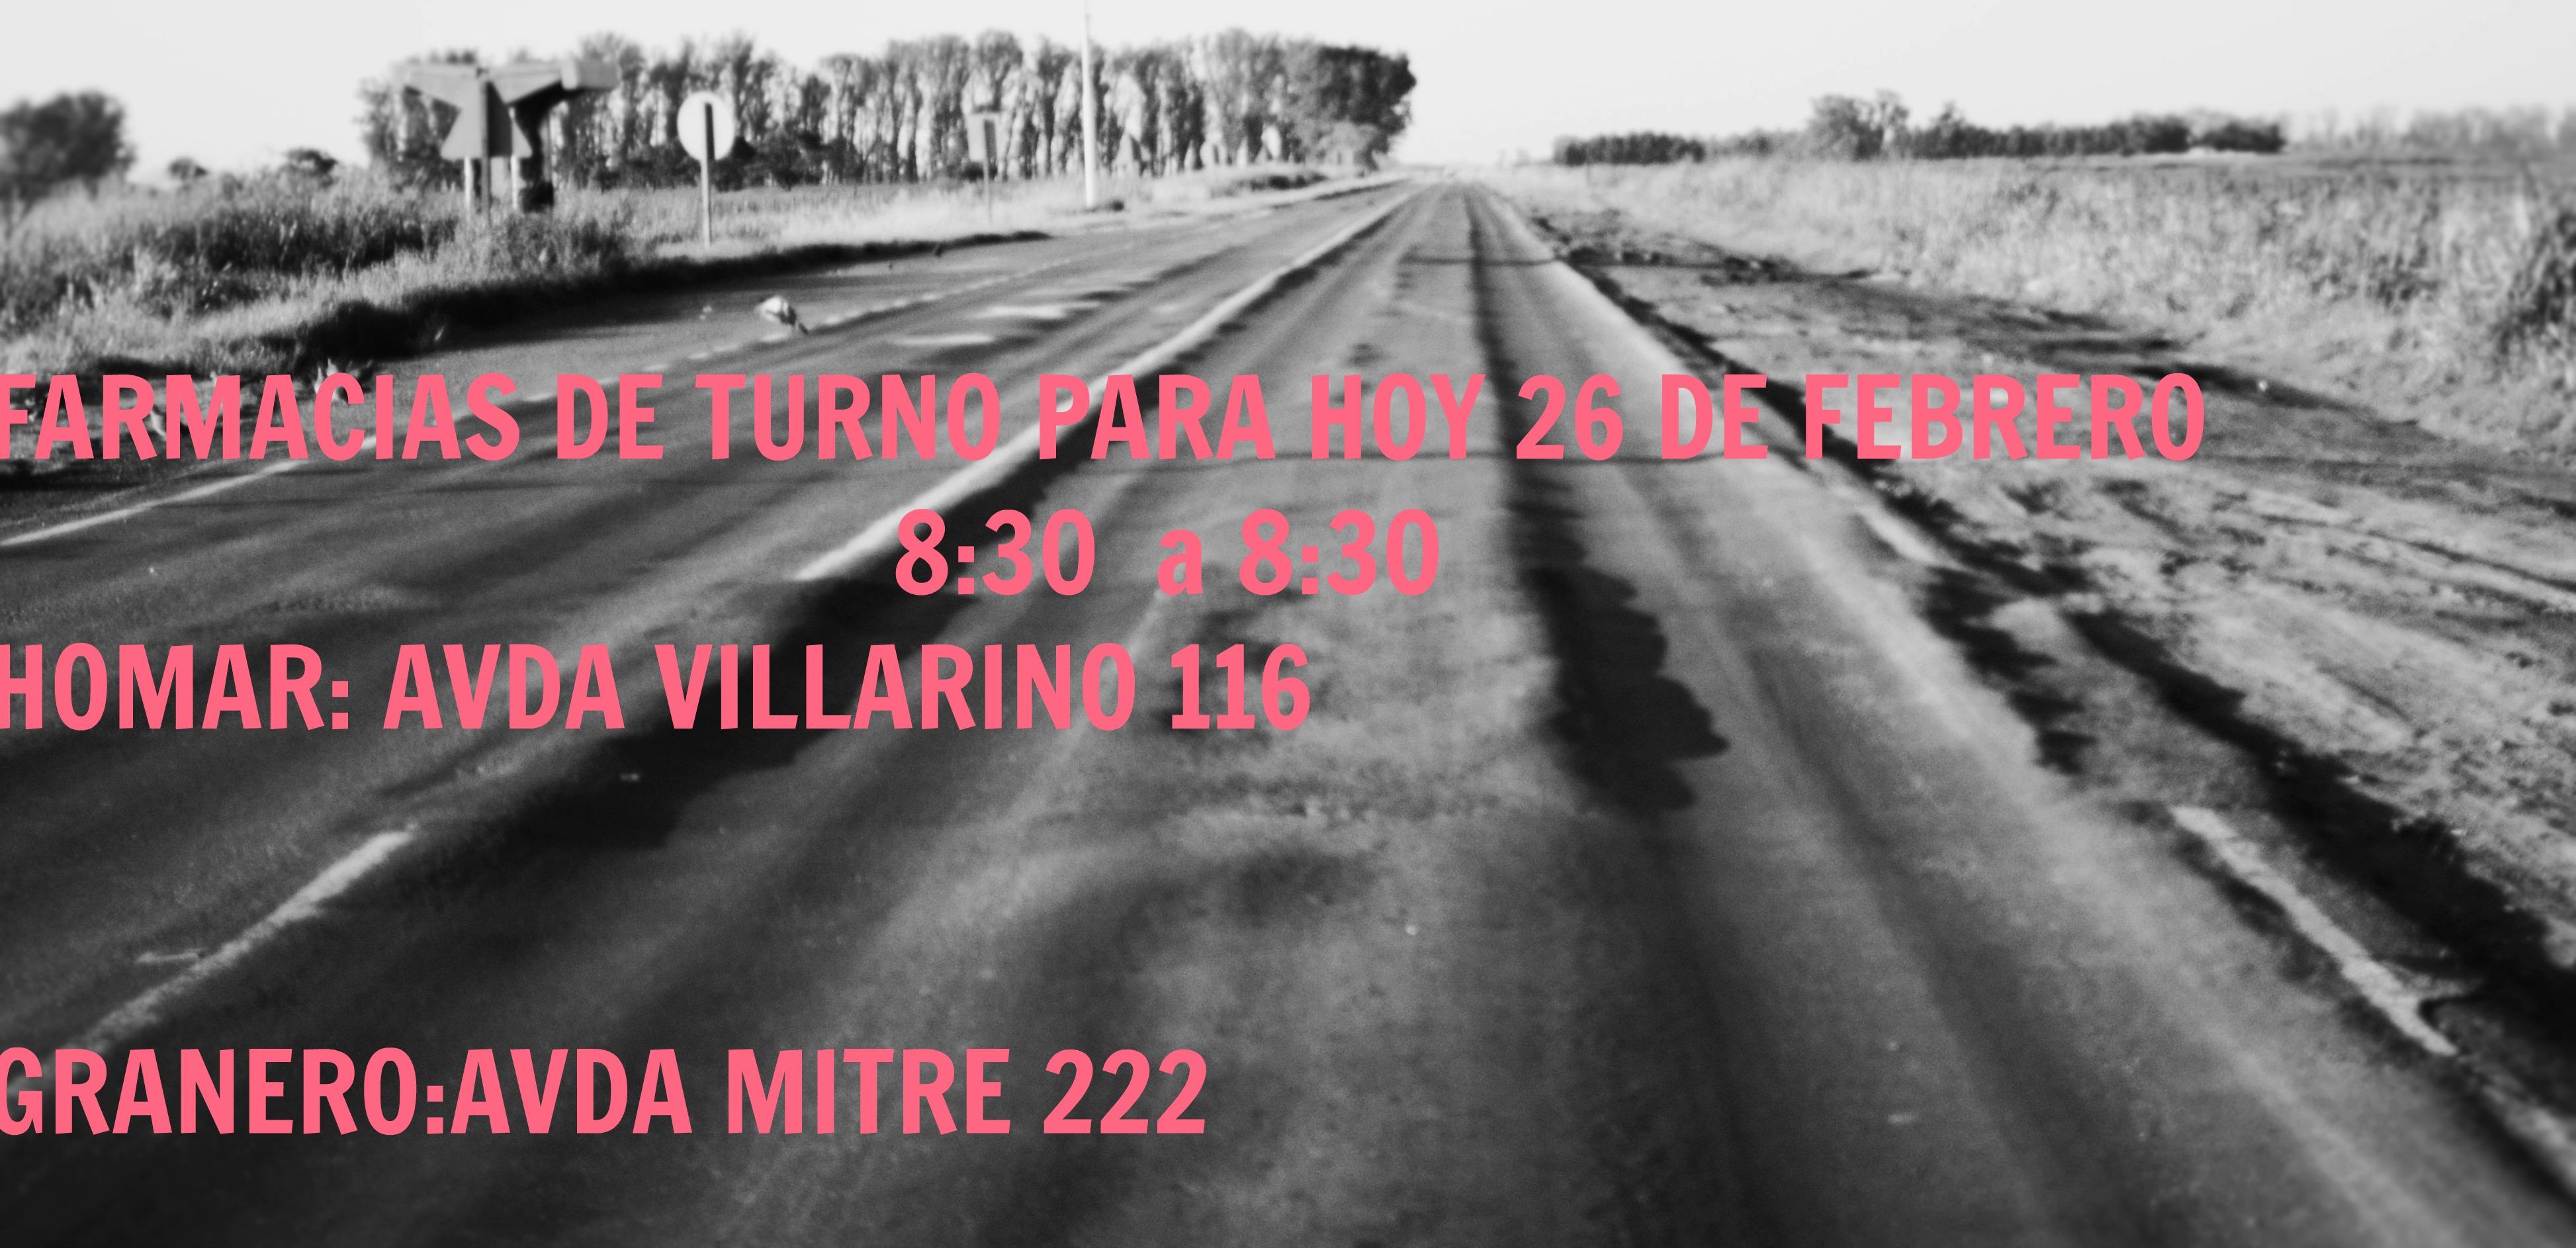 Farm26feb